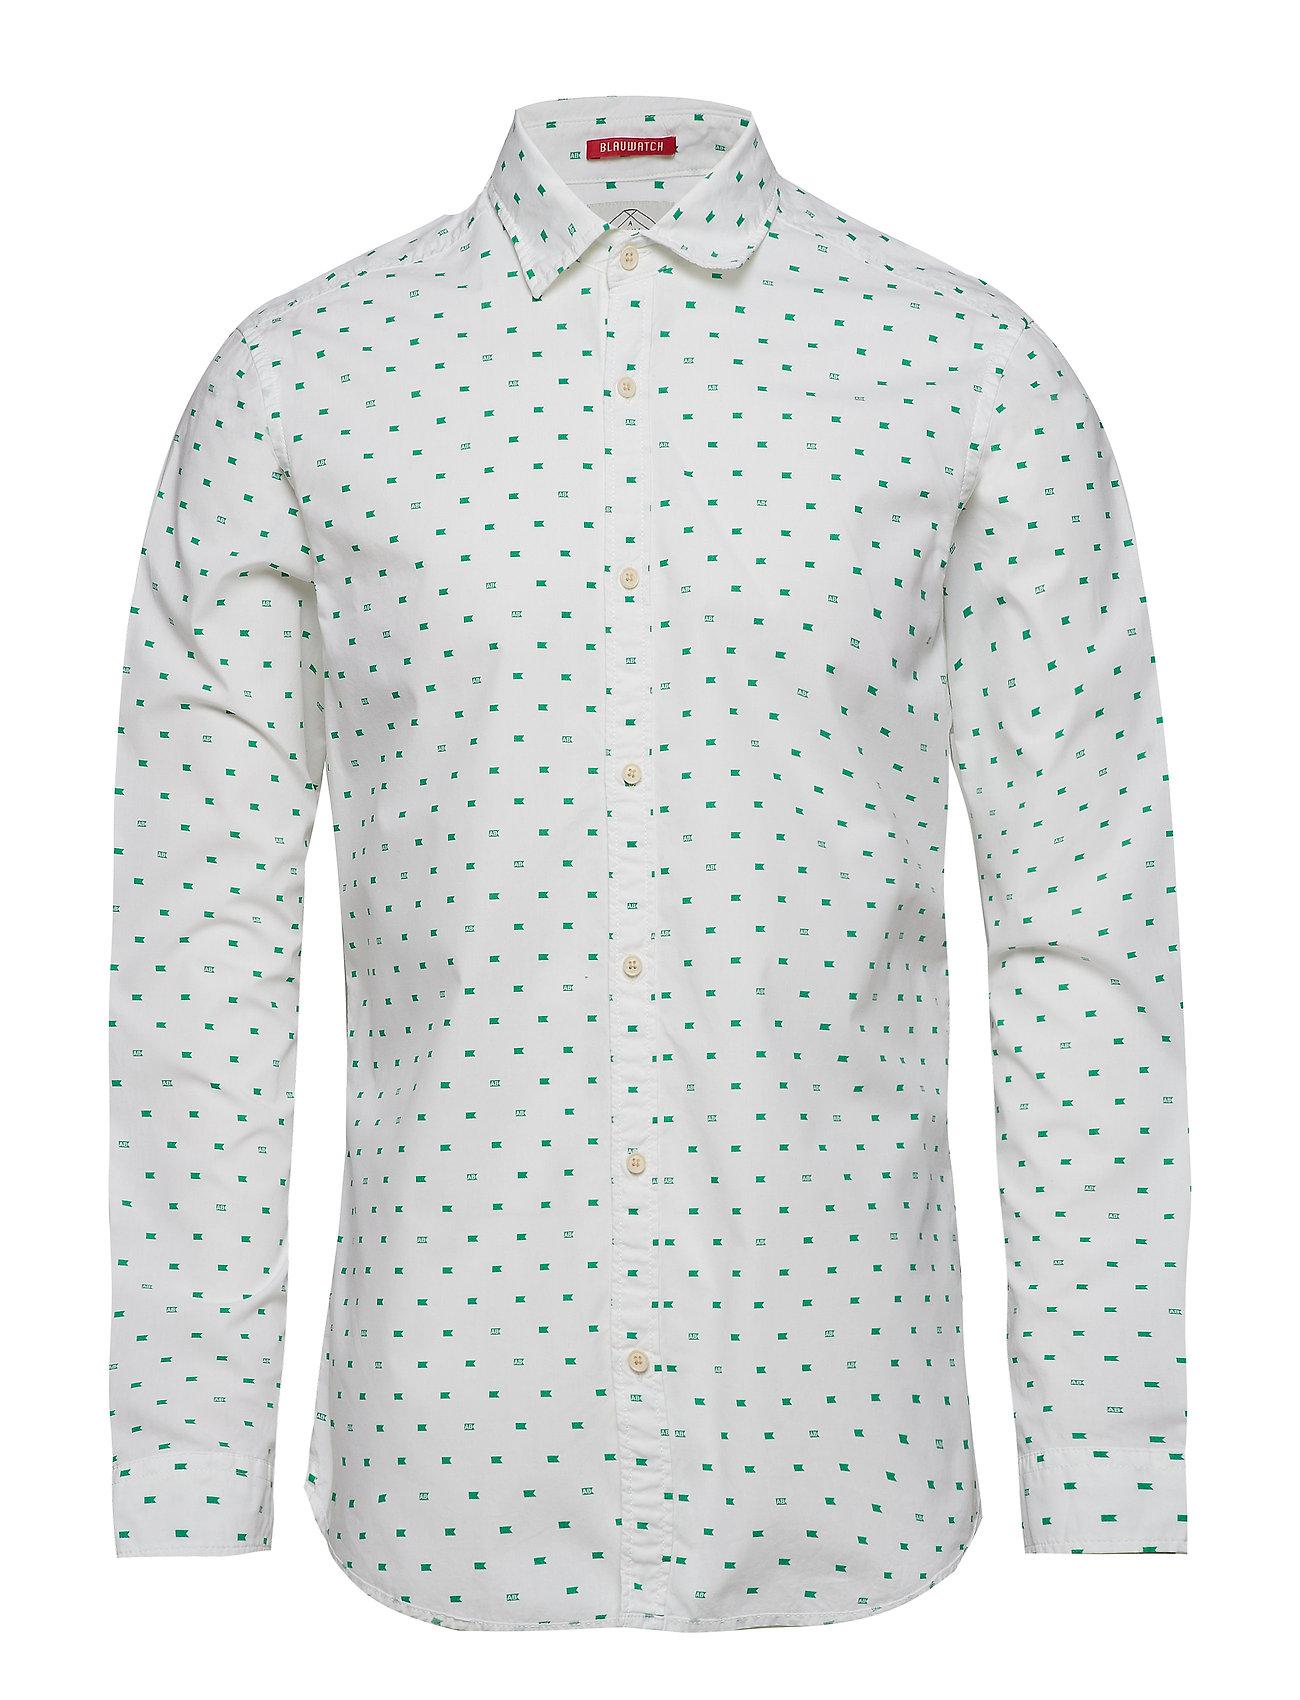 Scotch & Soda Slim fit crispy L/S shirt with prints - COMBO E